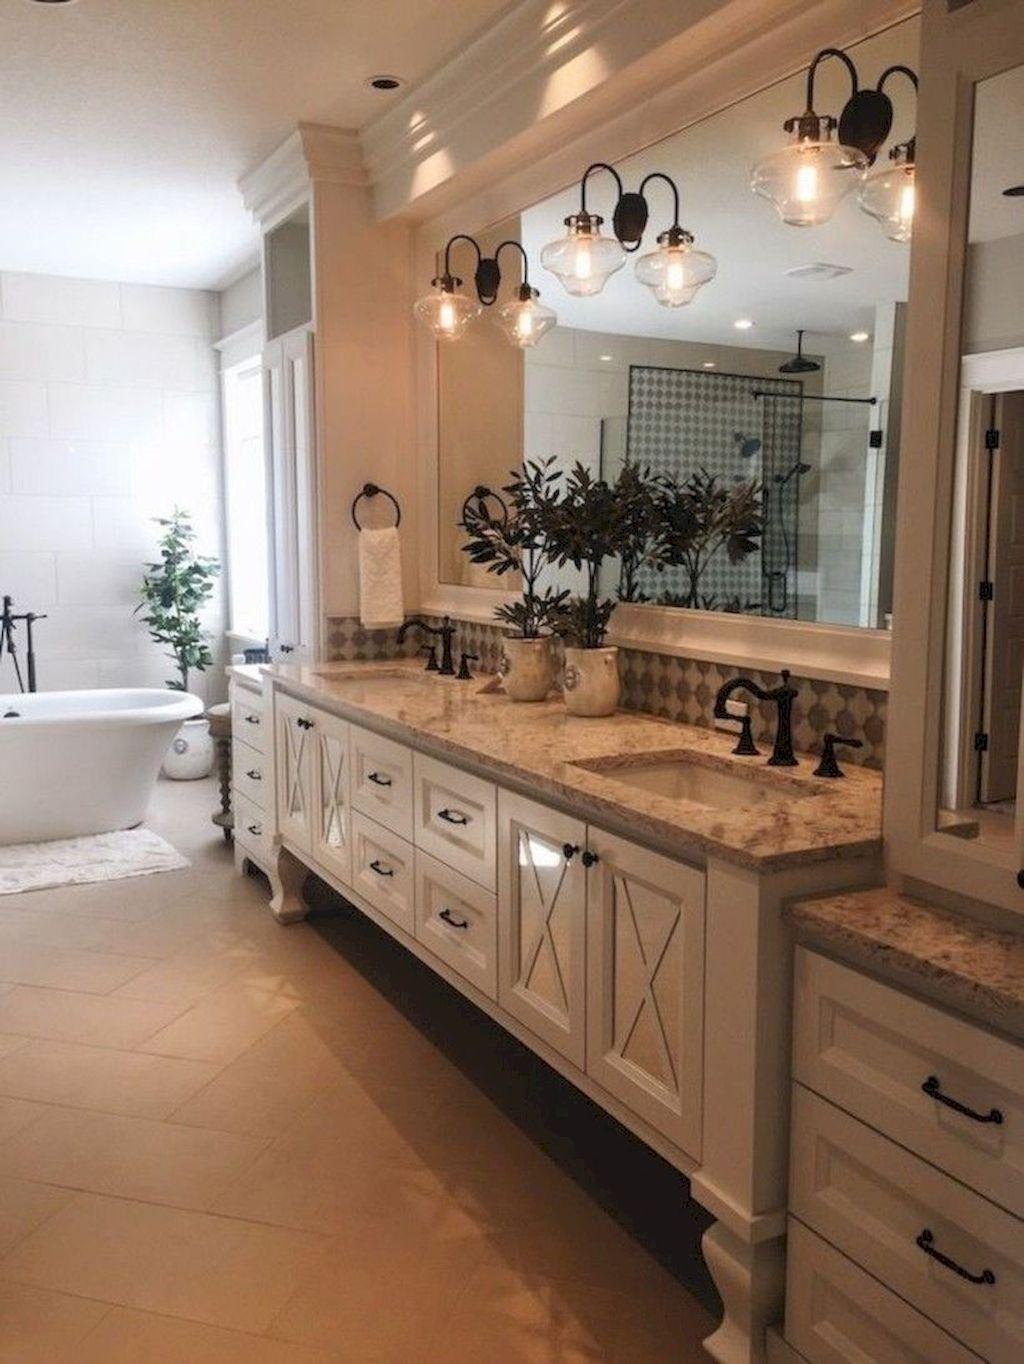 Relax Rustic Farmhouse Bathroom Design Ideas | Rustic ...